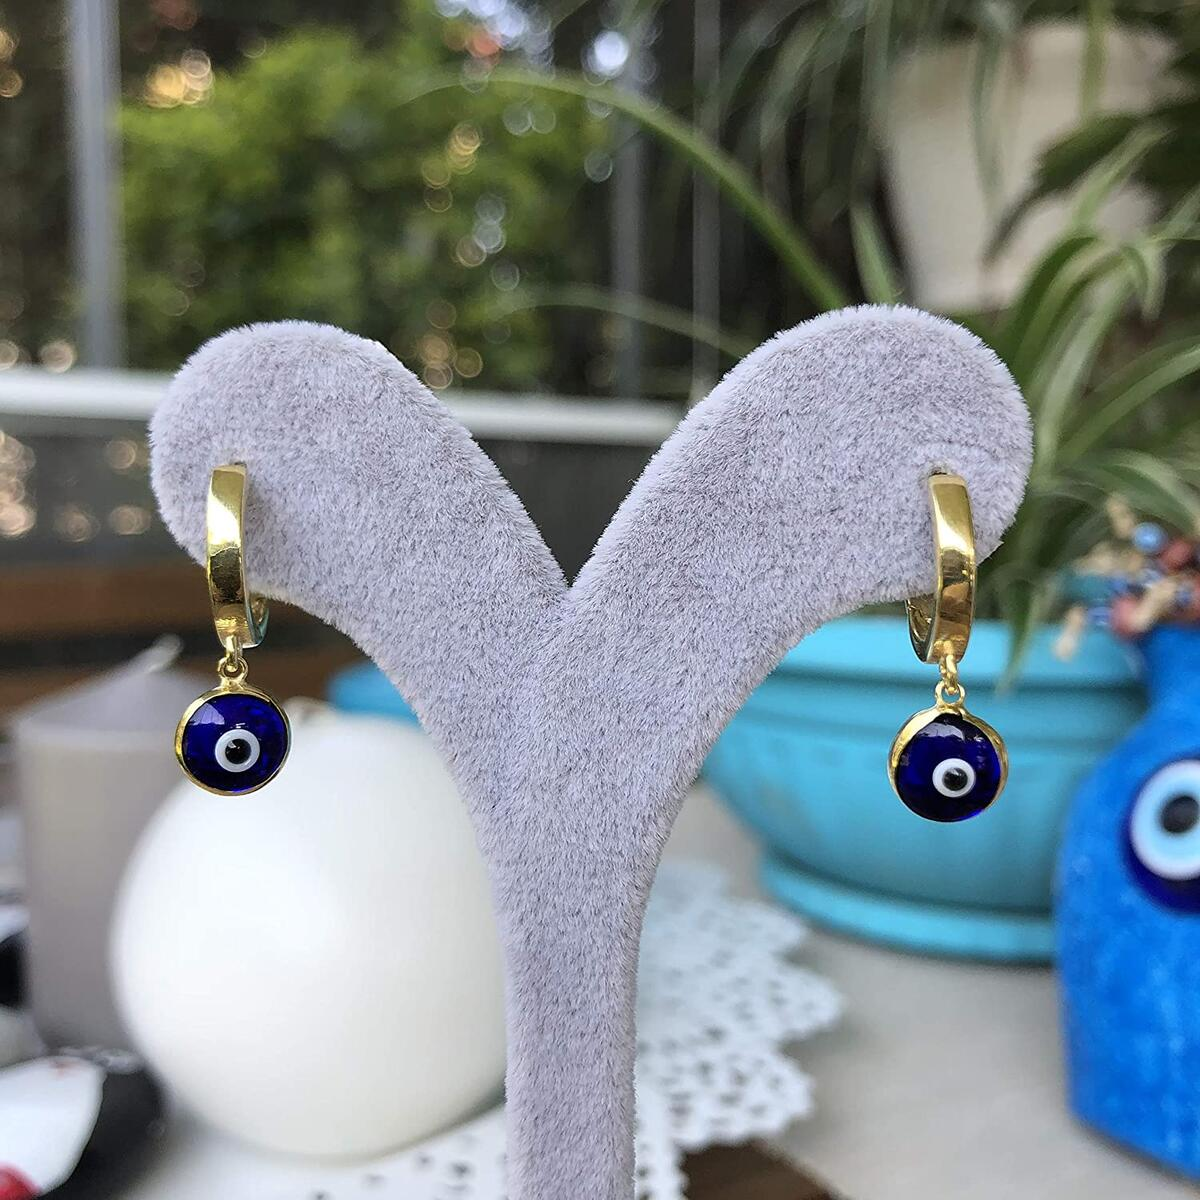 925 Sterling Silver Huggie Hoop Earrings for Women, Cubic Zirconia Rhodium Plated Dangle Hamsa Evil Eye Cross Clover Star Angel Wing Earrings, Small Hoop Huggie Earrings for Women